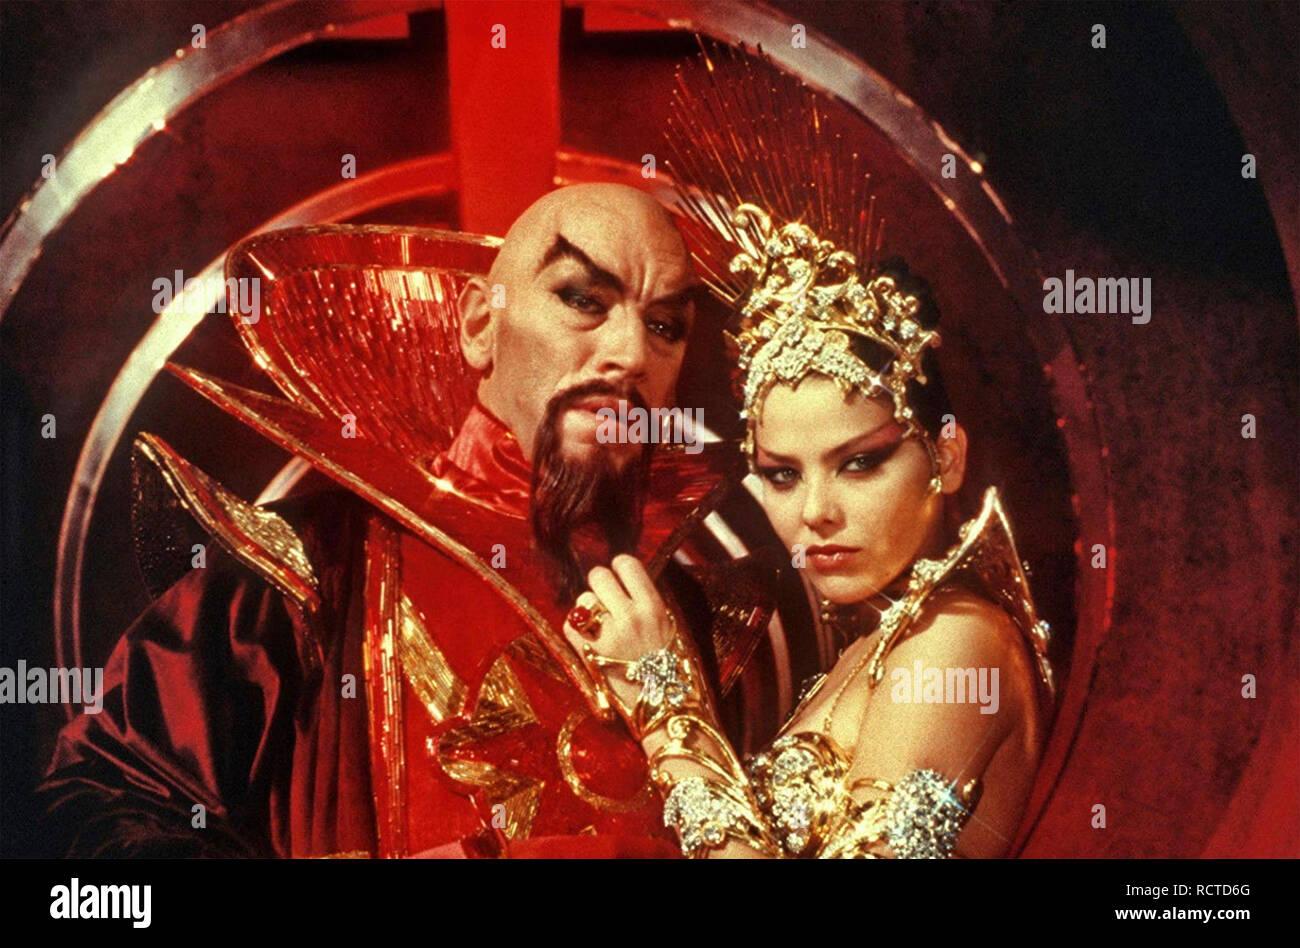 FLASH GORDON 1980 Universal film with from left: Max von Sydow and  Ornella Muti Stock Photo